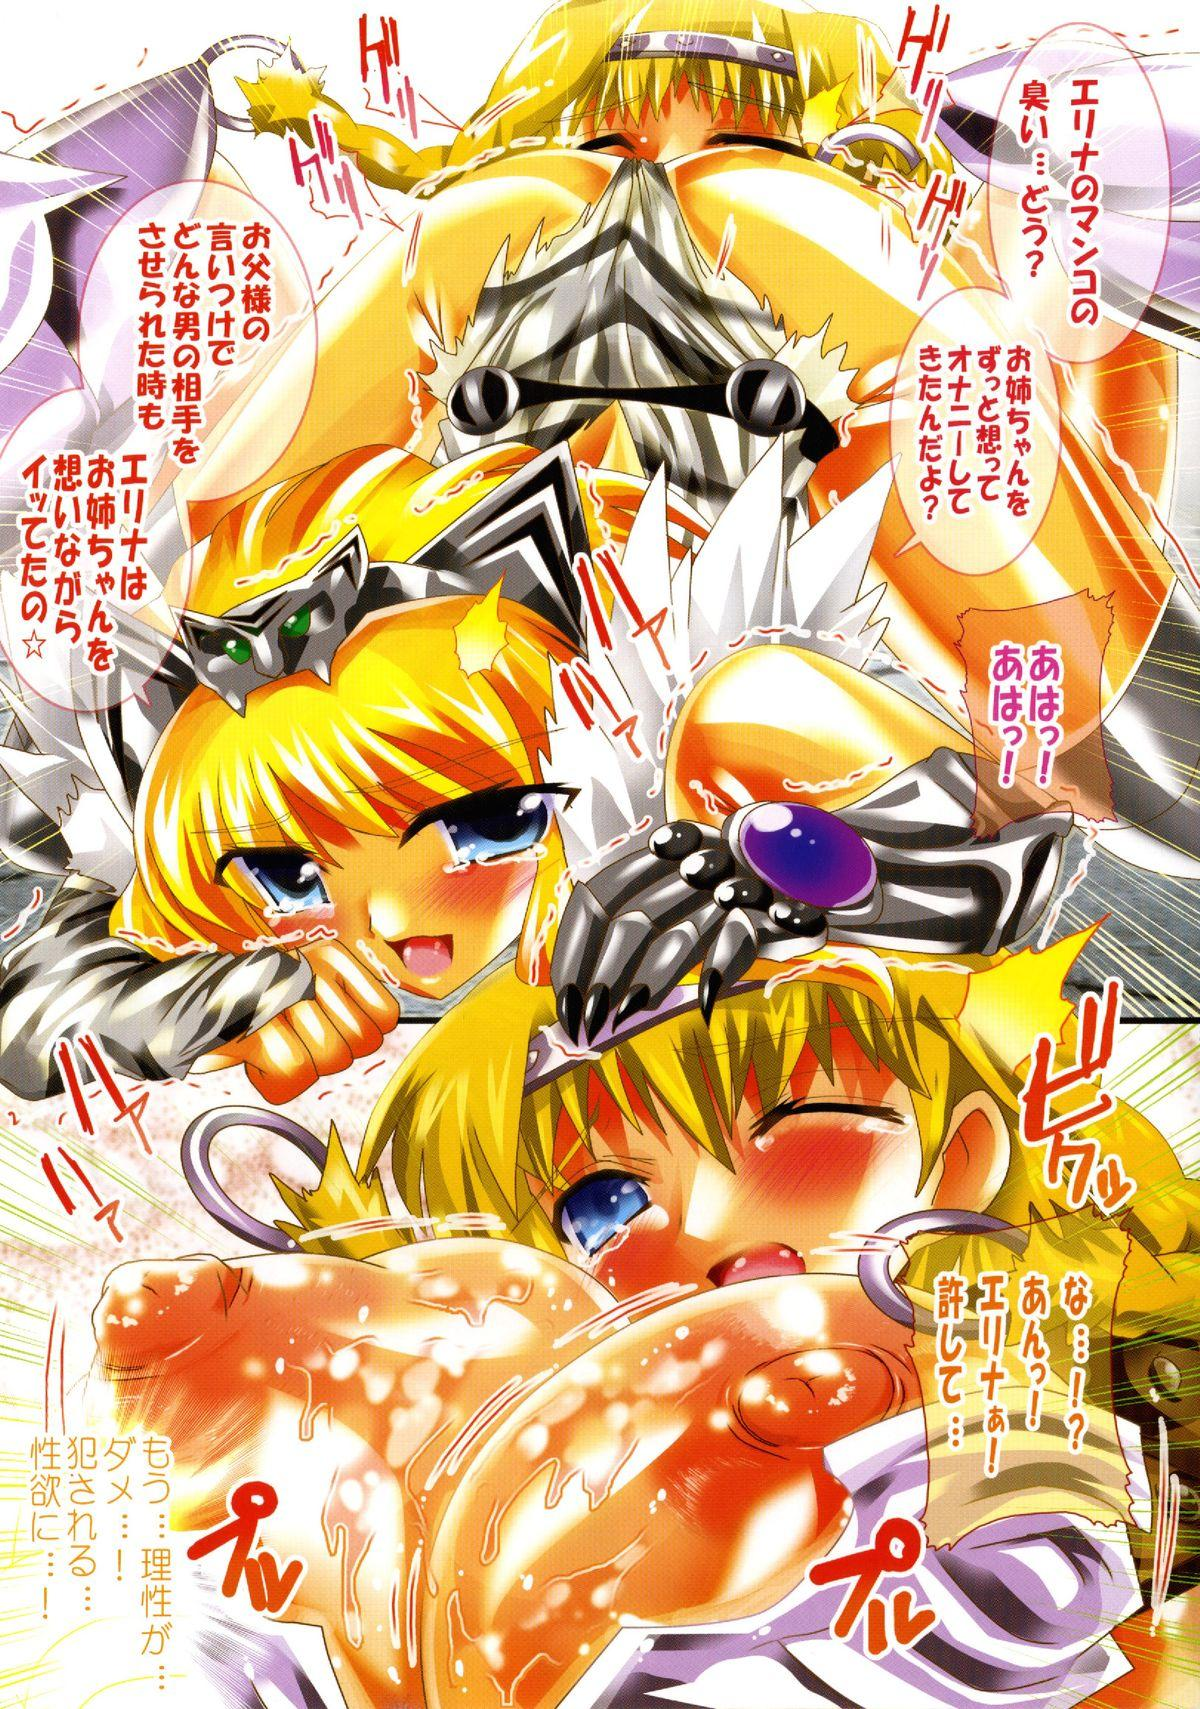 Full Color de Battle! Kiwadoi Suji no Nakami Zenbu Misechaimashita☆ 6